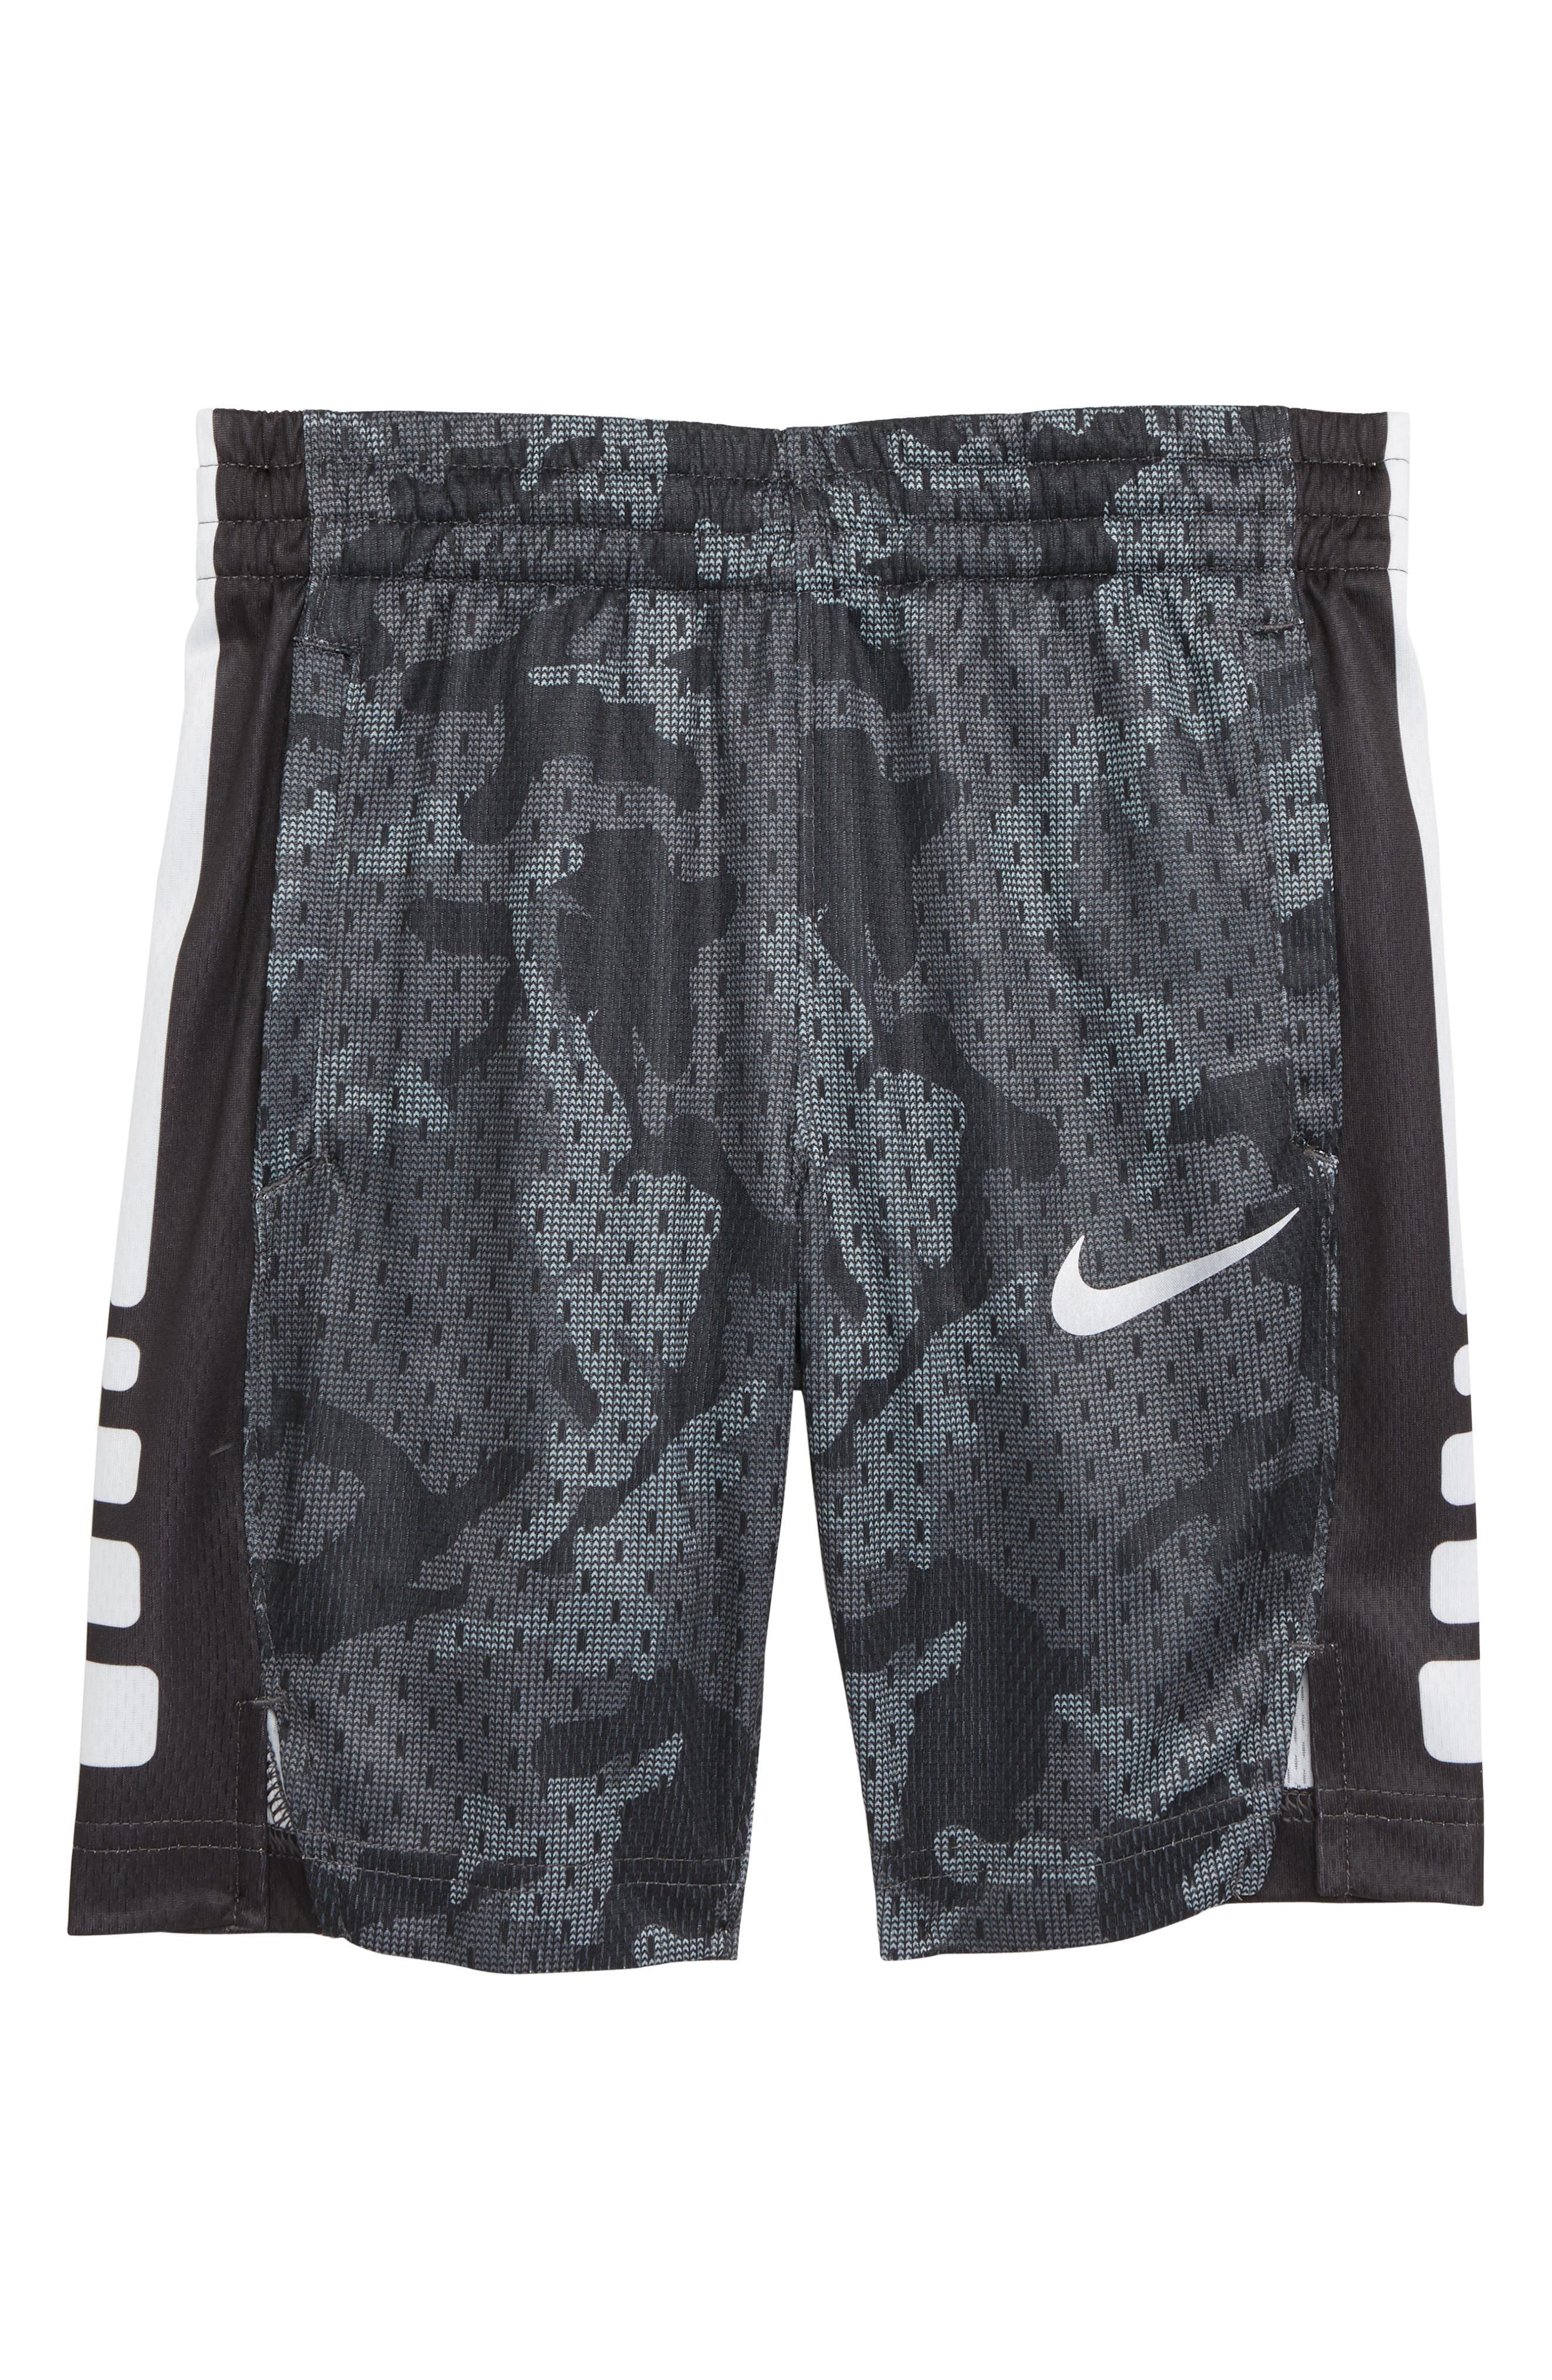 Dry Elite Basketball Shorts,                             Main thumbnail 1, color,                             WOLF GREY